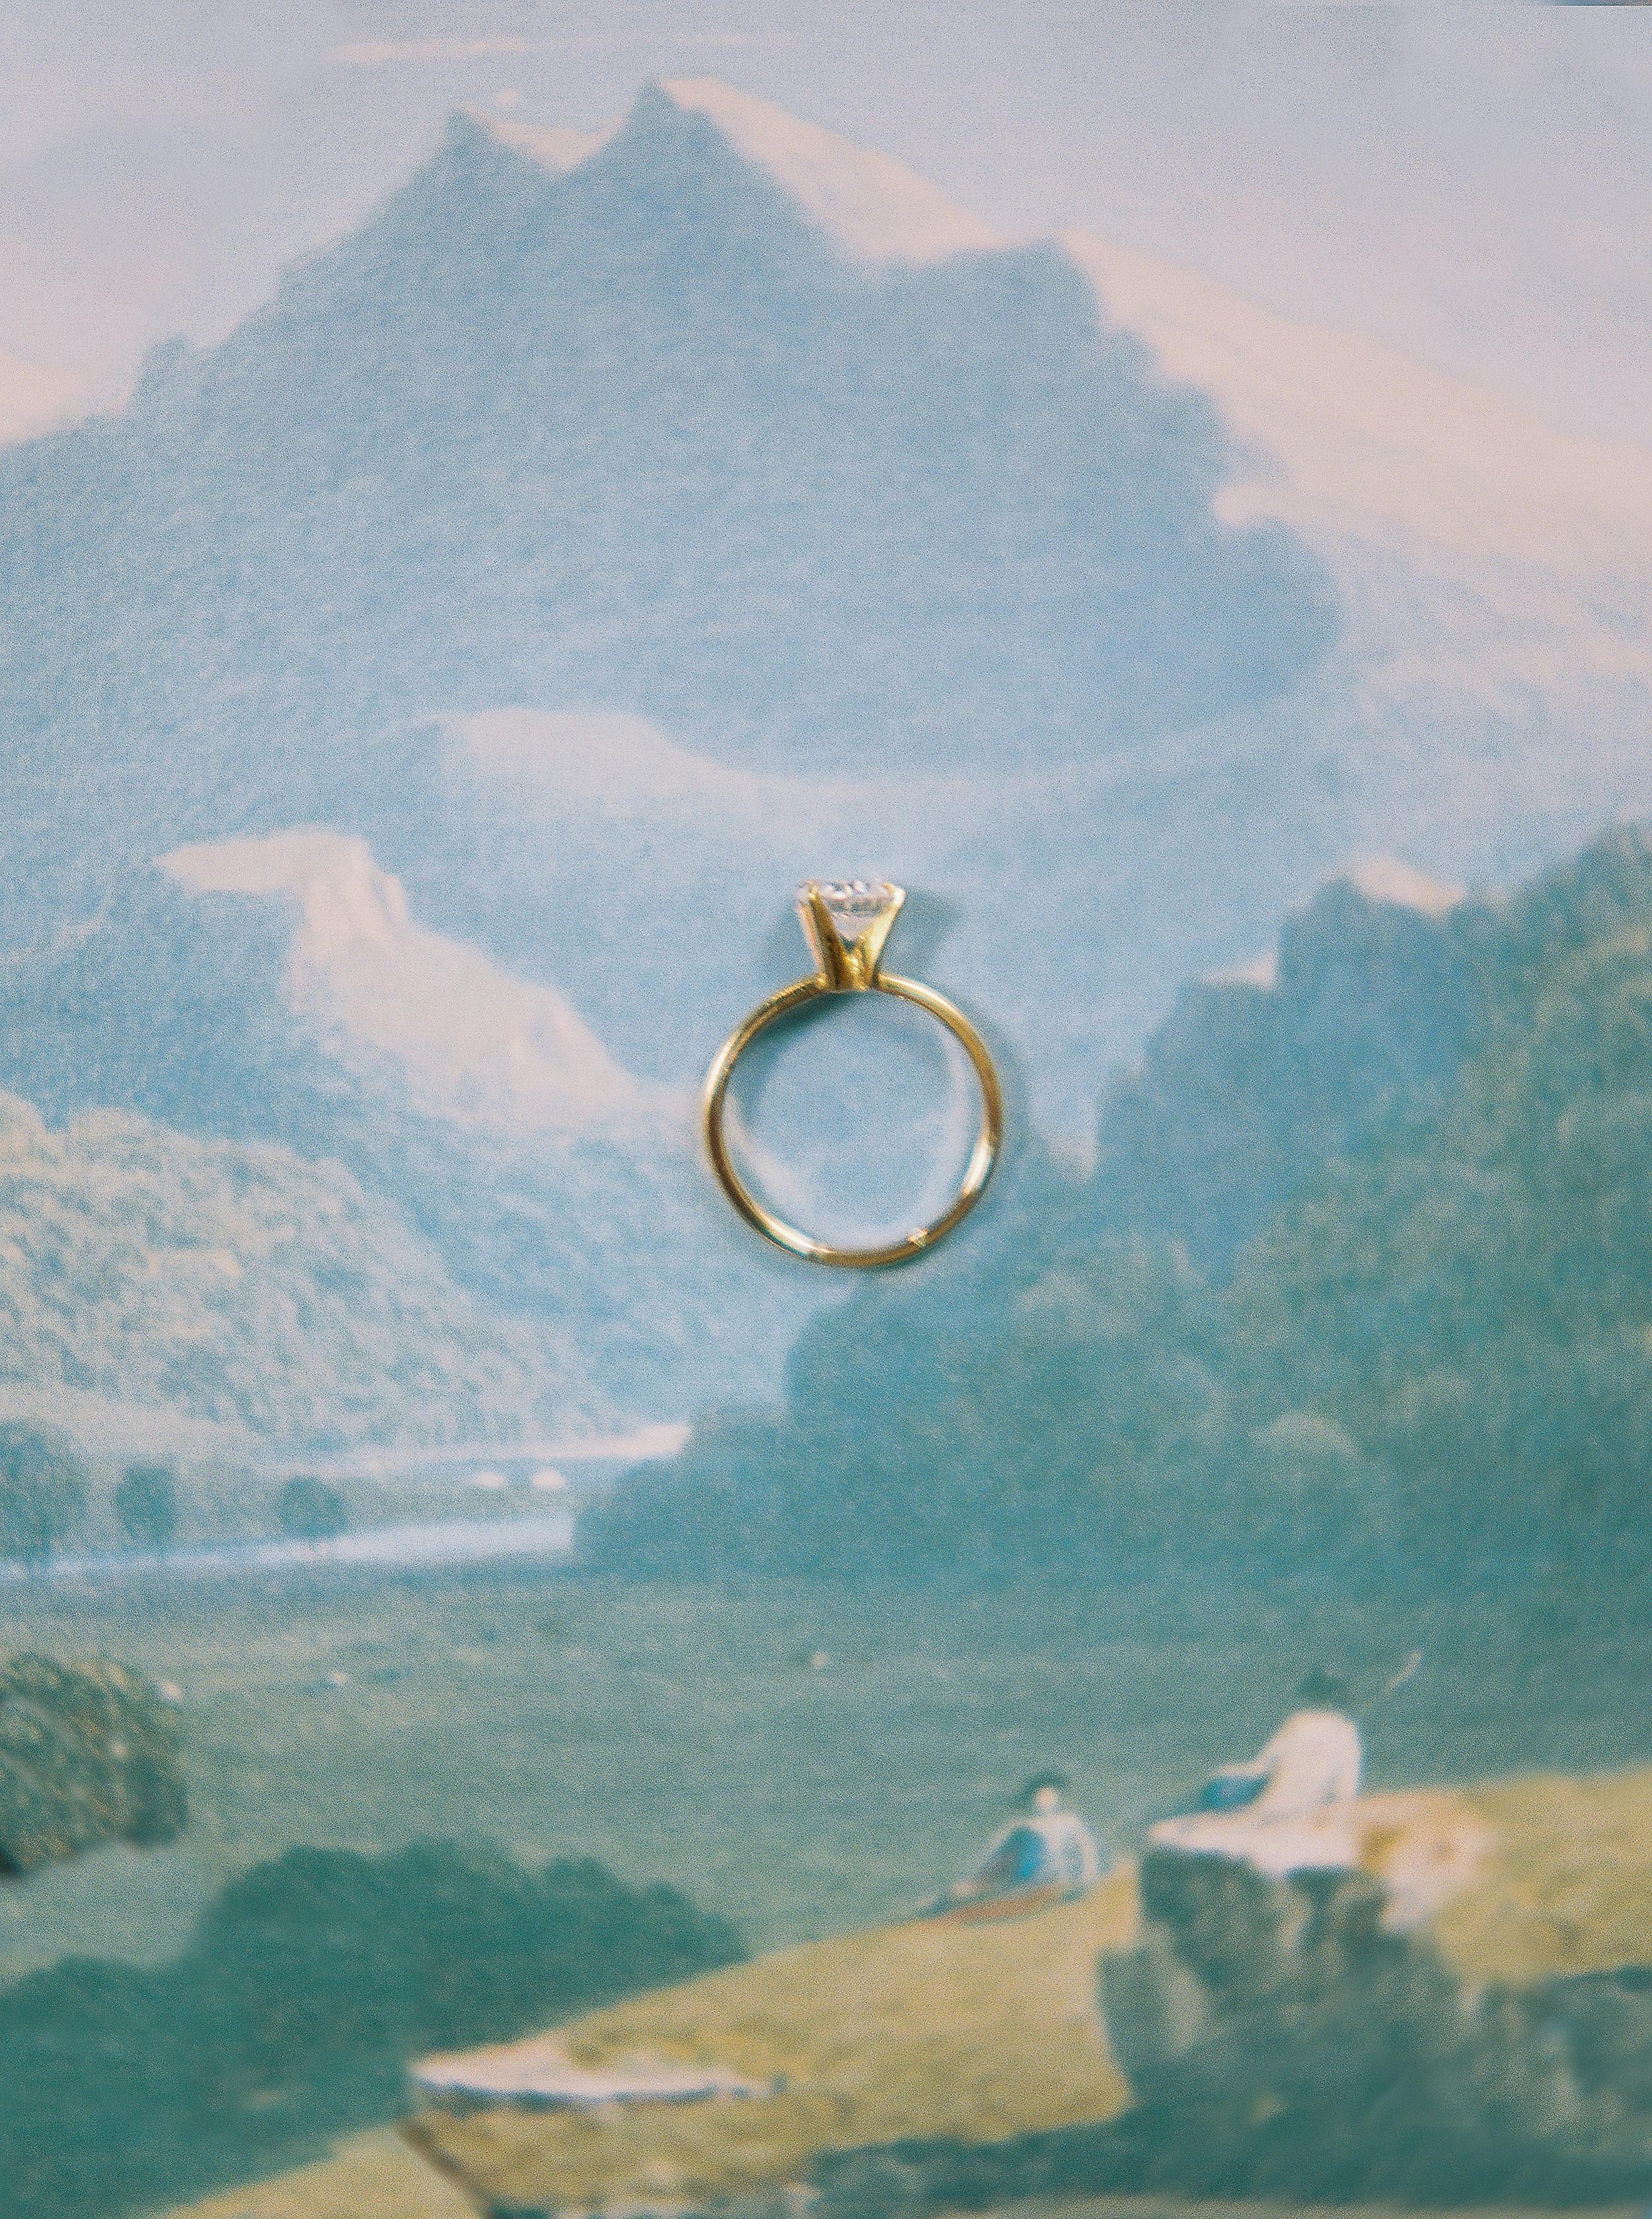 Alexandra-Elise-Photography-Film-Branding-Photographer-Rochester-New-York-Stone-Fruit-Studio-Wedding-Invitations-014.jpg